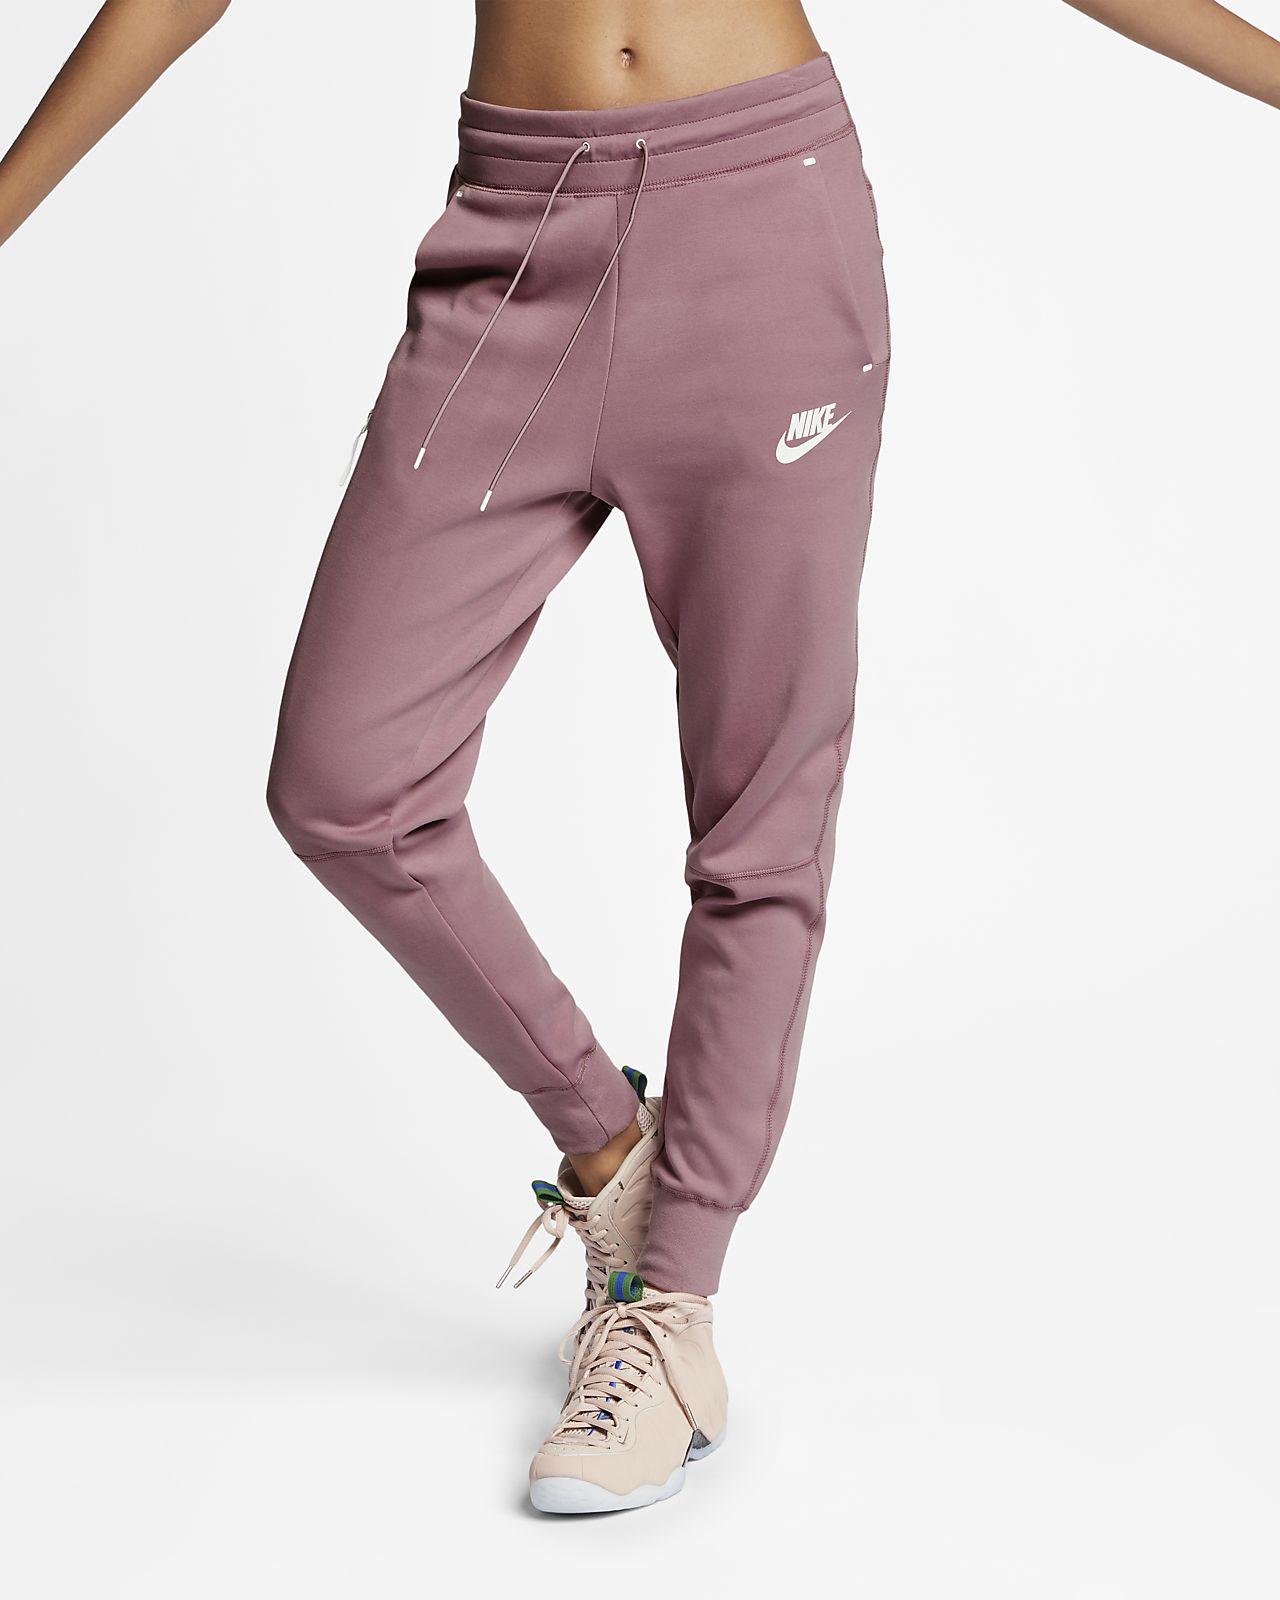 Byxor Nike Sportswear Tech Fleece för kvinnor